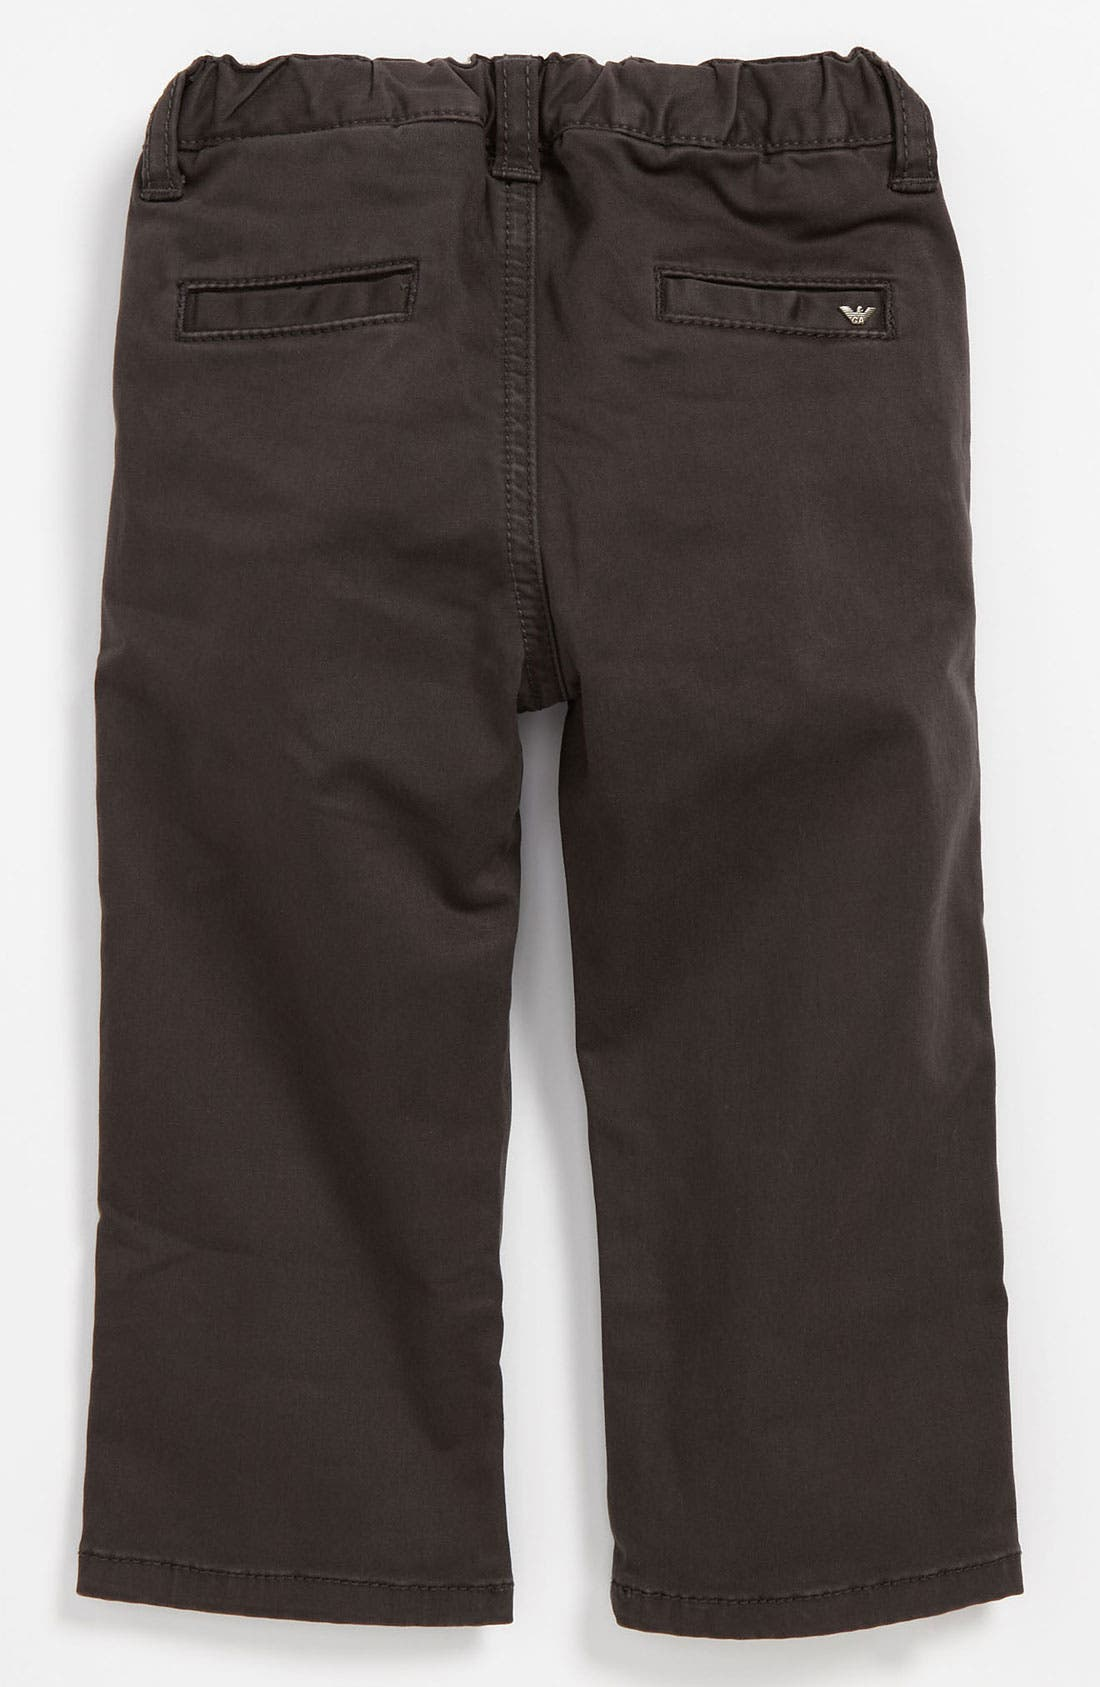 Alternate Image 1 Selected - Armani Junior Skinny Leg Pants (Infant)